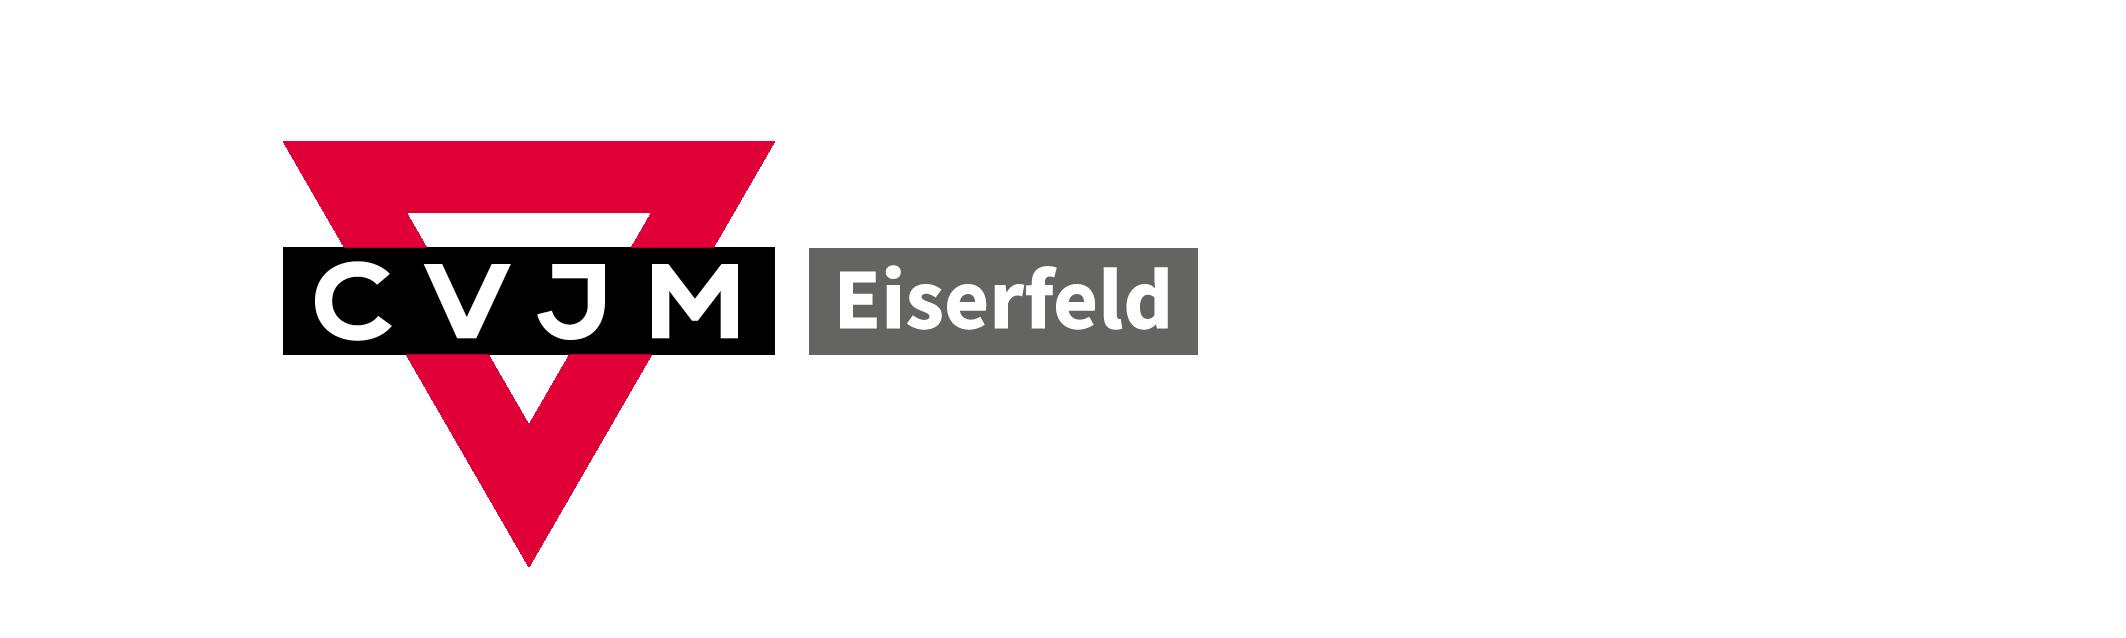 CVJM Eiserfeld